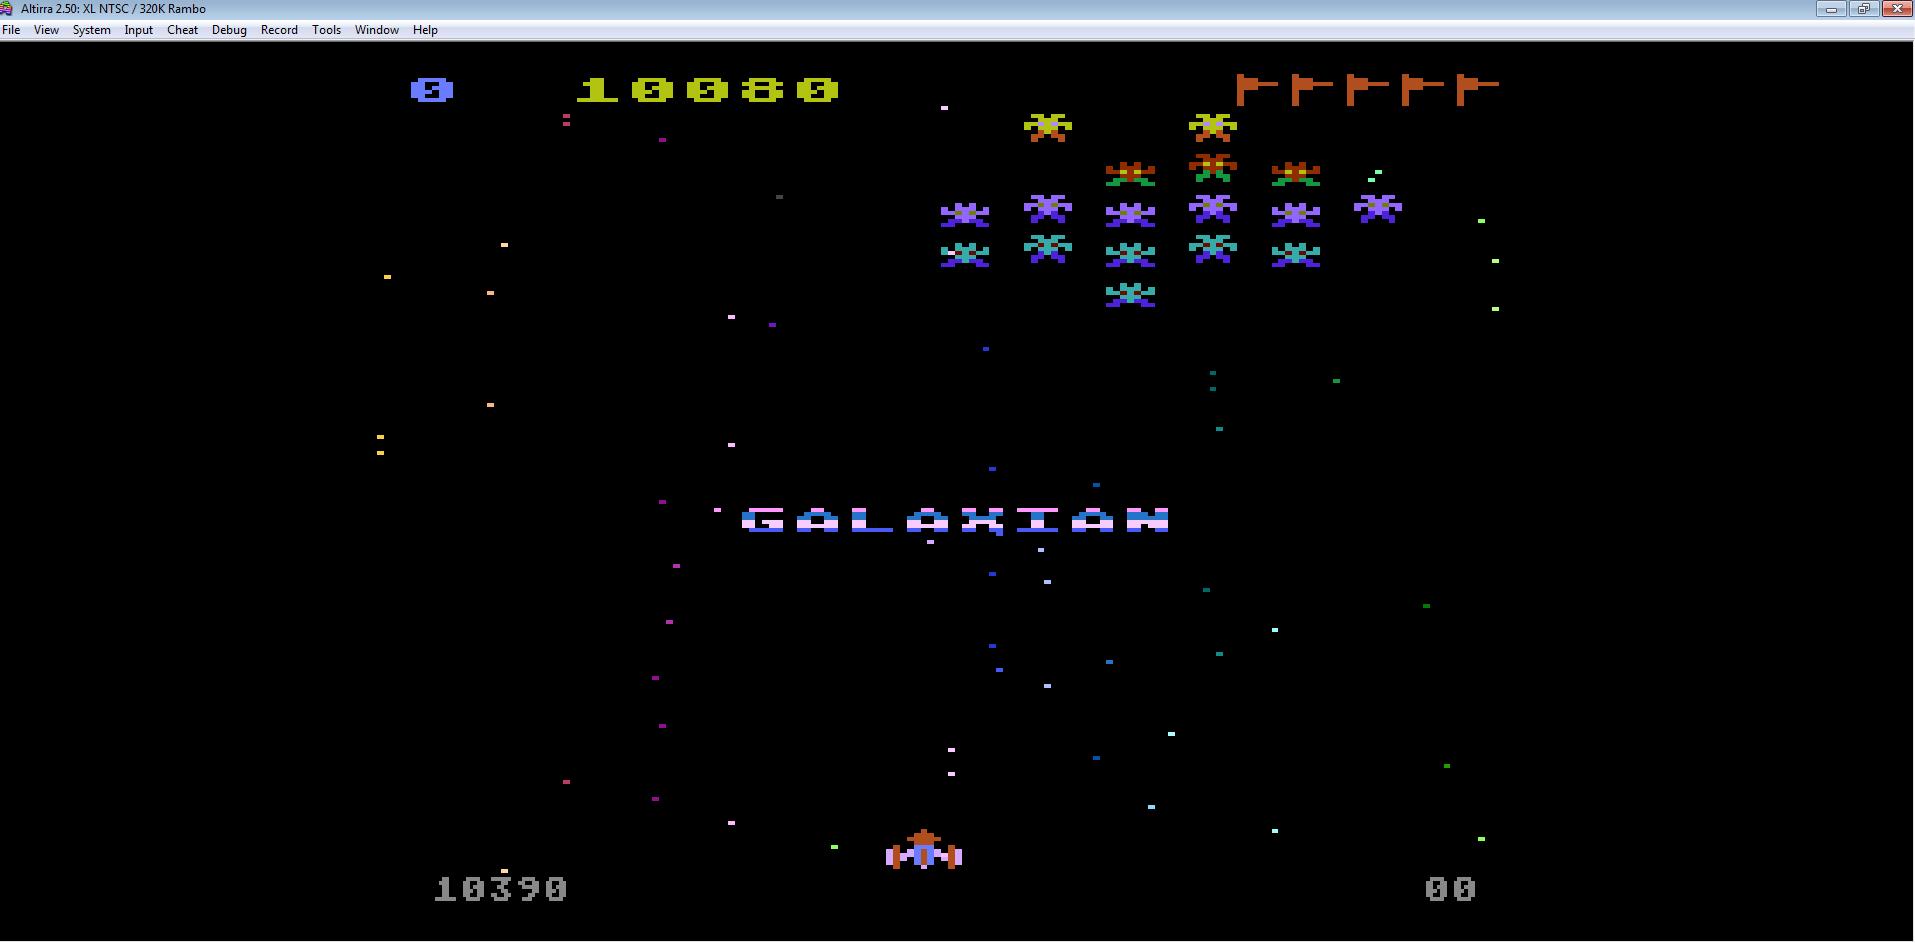 Liduario: Galaxian (Atari 400/800/XL/XE Emulated) 10,390 points on 2014-08-31 21:42:52